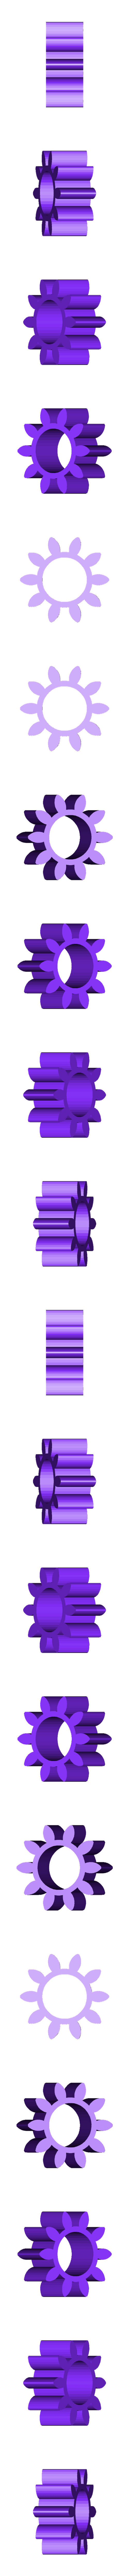 pocket_gears_small_v2.STL Download free STL file Pocket Gears • Model to 3D print, SPEKERDUDE